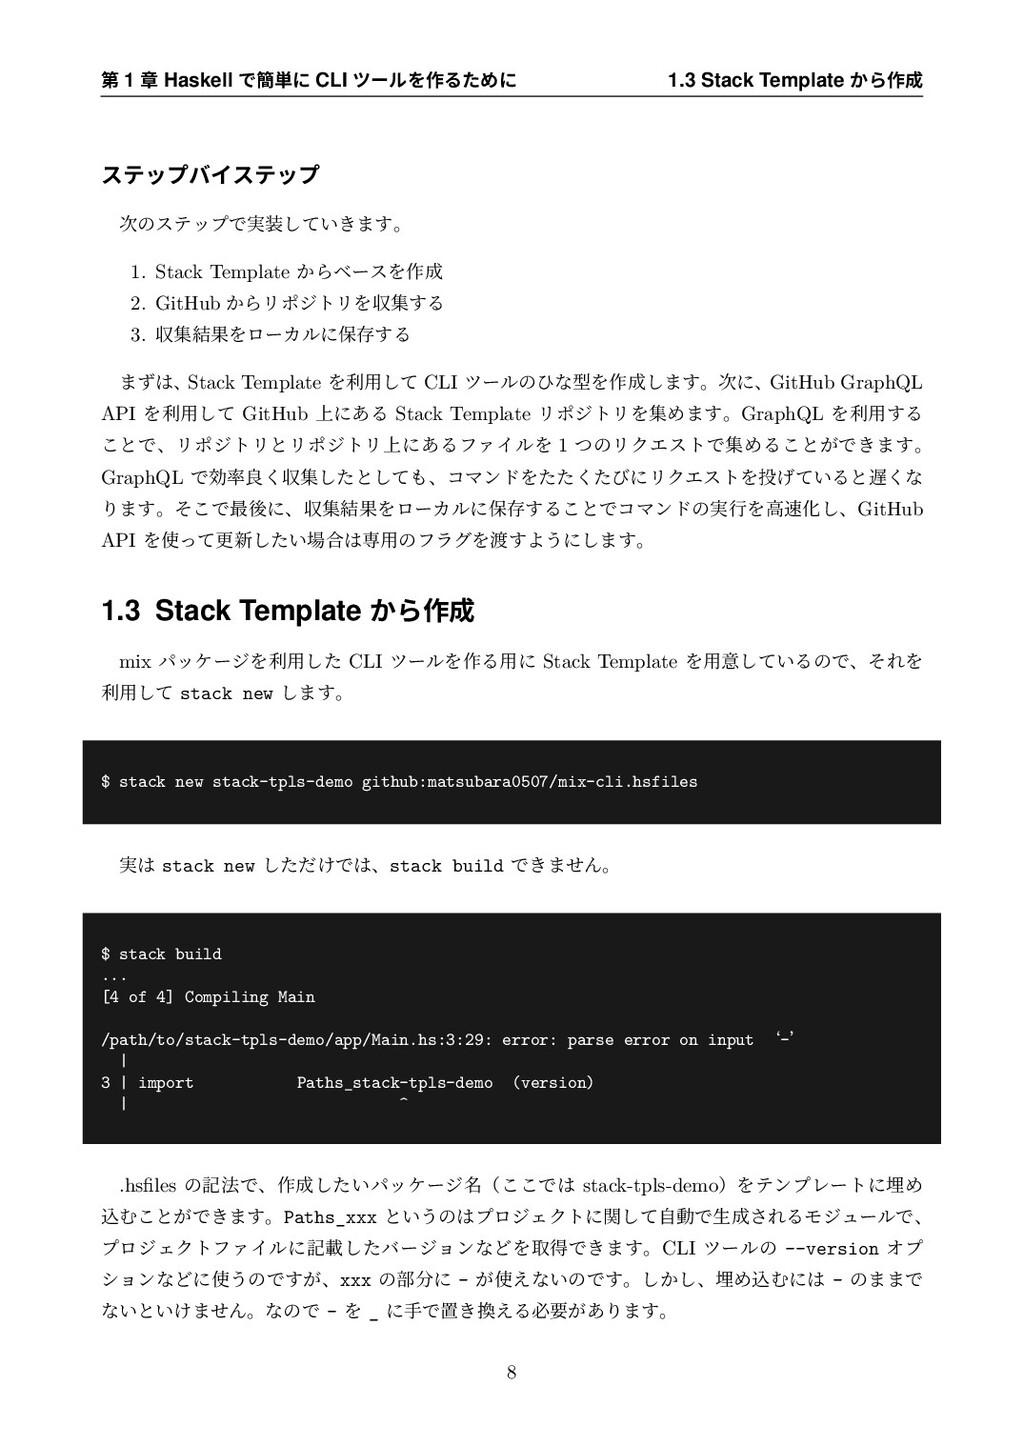 ୈ 1 ষ Haskell Ͱ؆୯ʹ CLI πʔϧΛ࡞ΔͨΊʹ 1.3 Stack Temp...